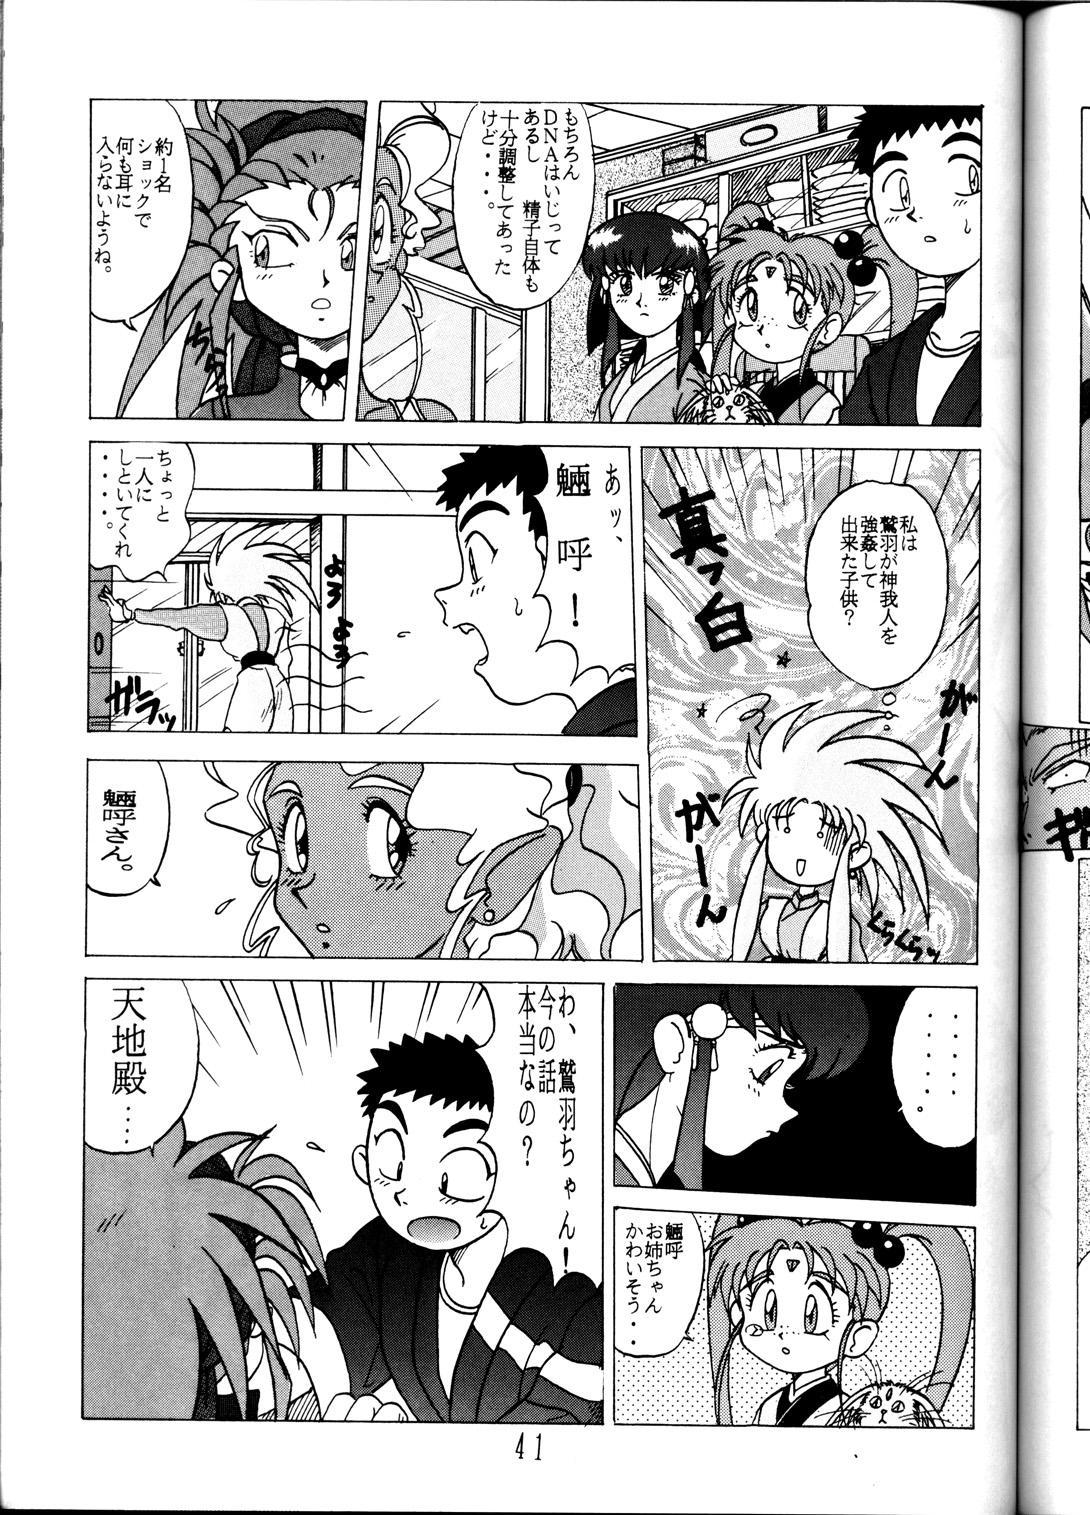 Tenchi Muyou! Sample Vol 6 39